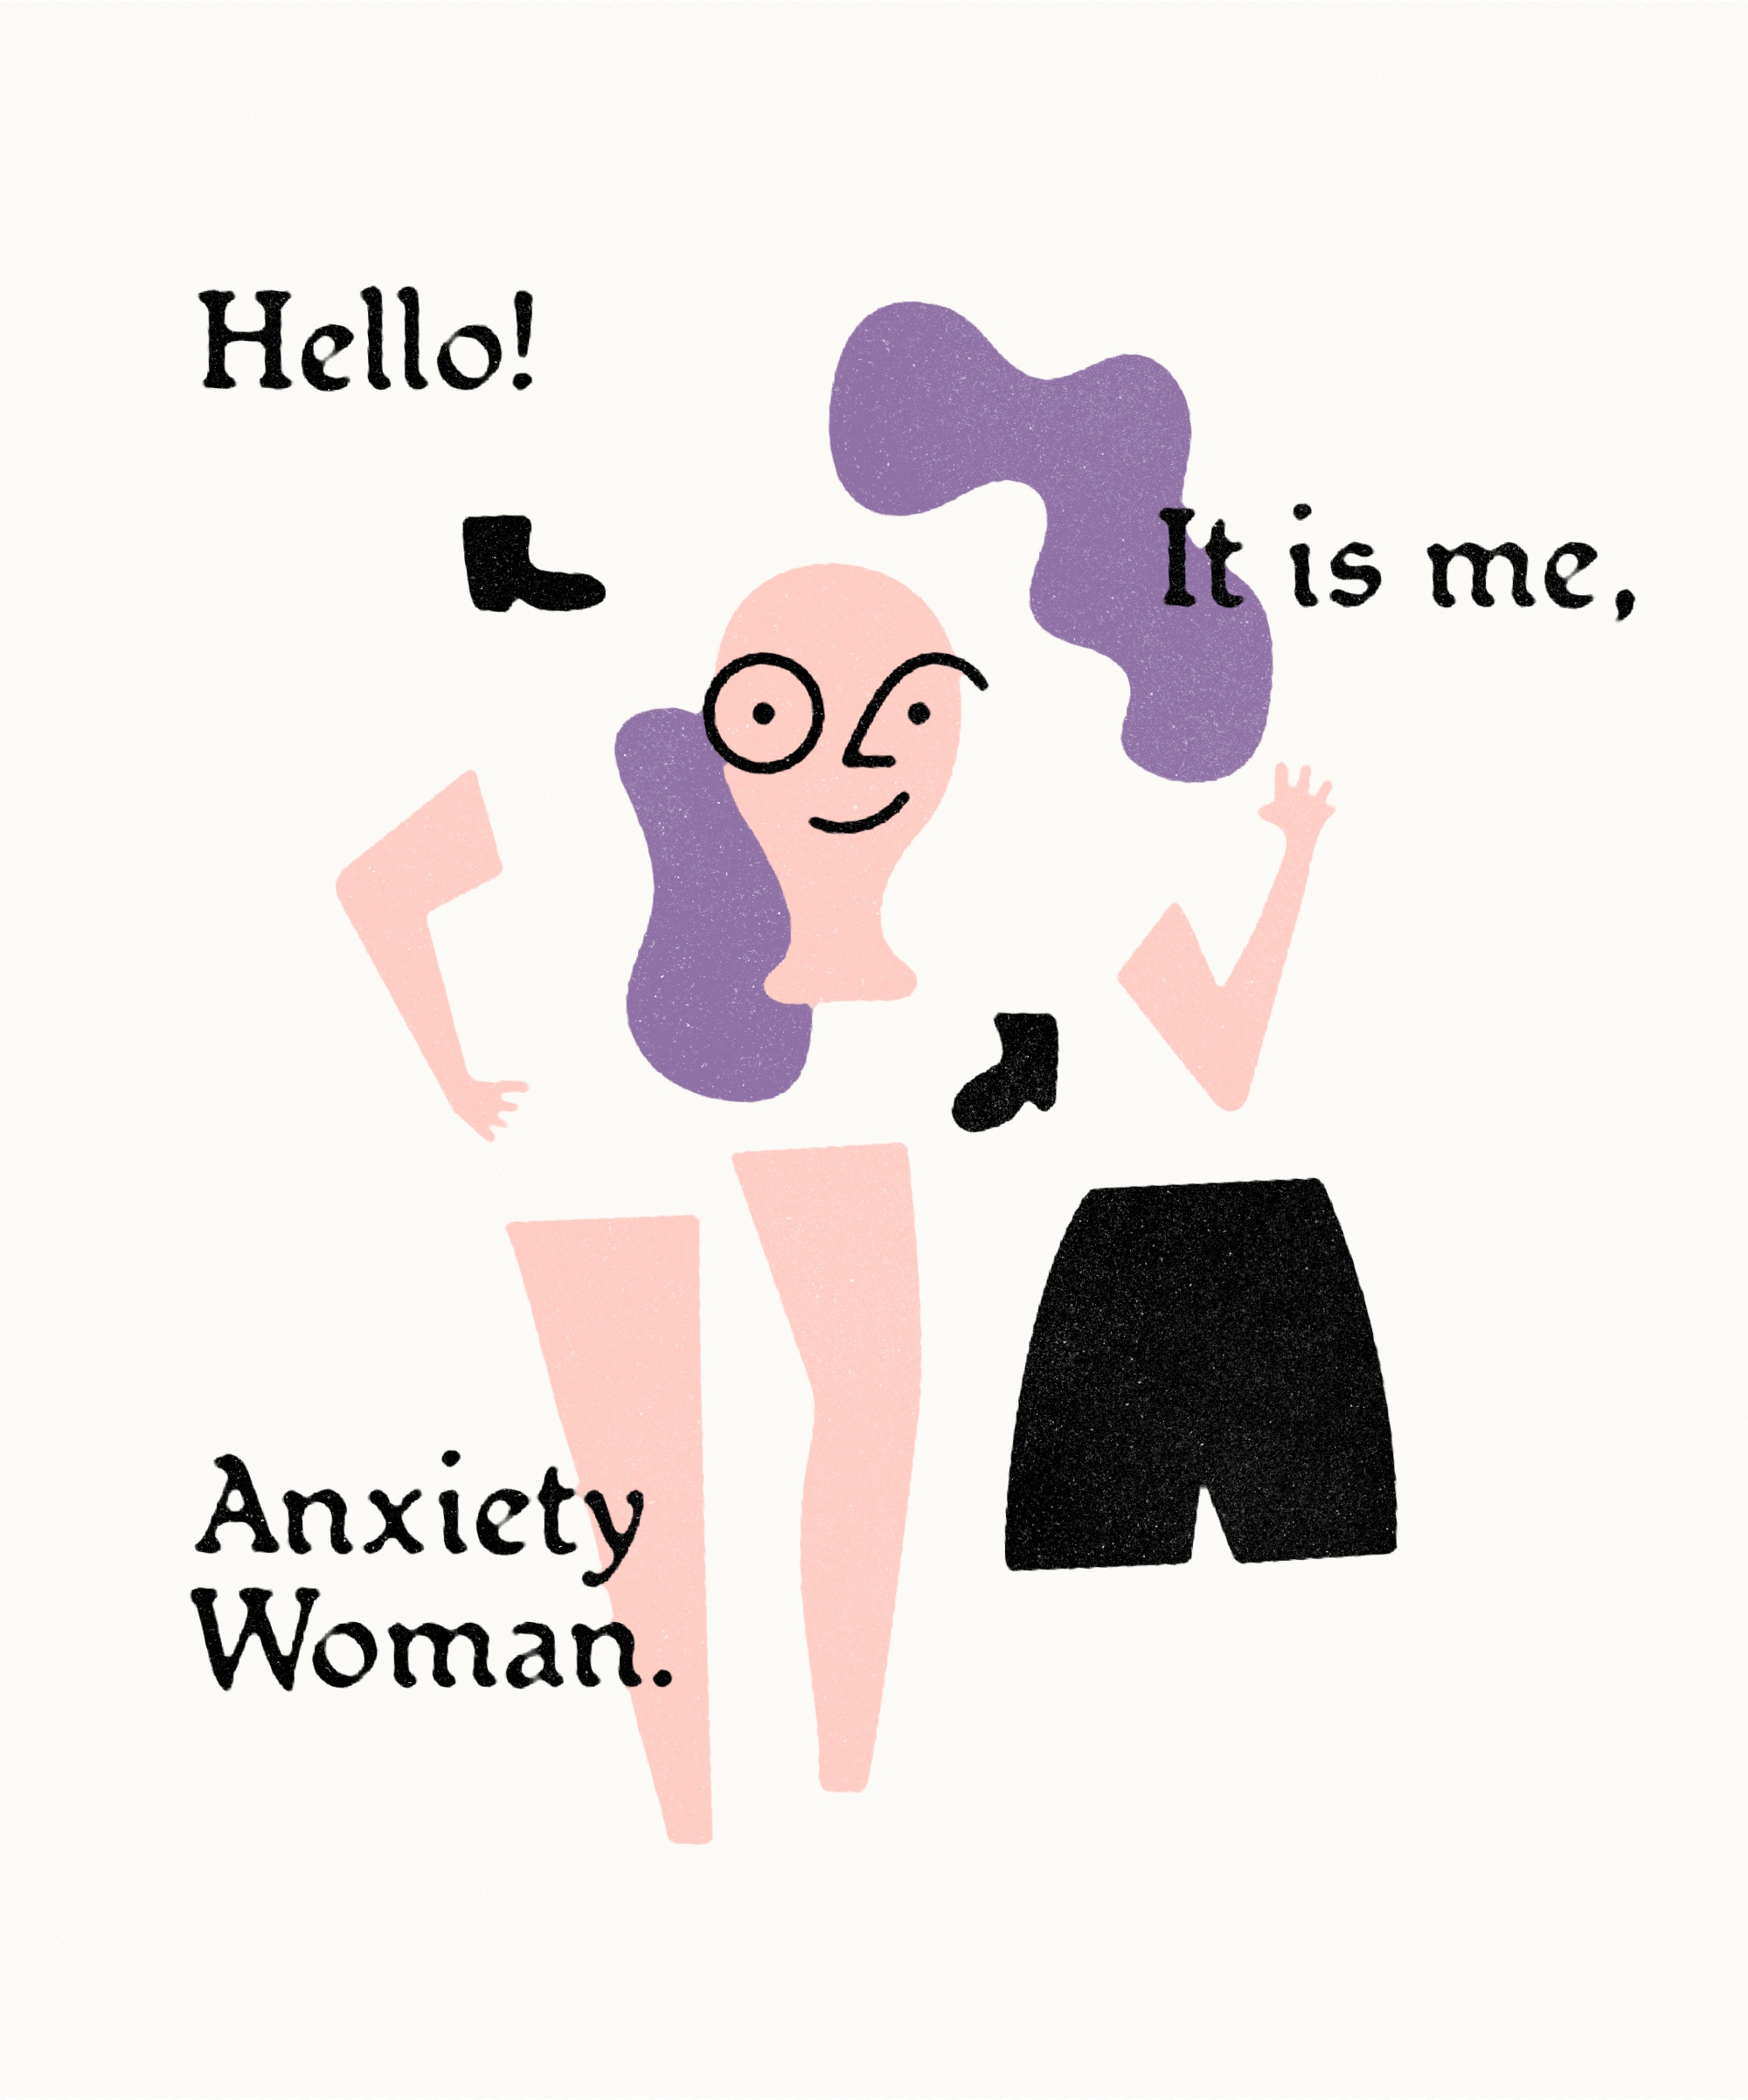 Anxietywoman pin2